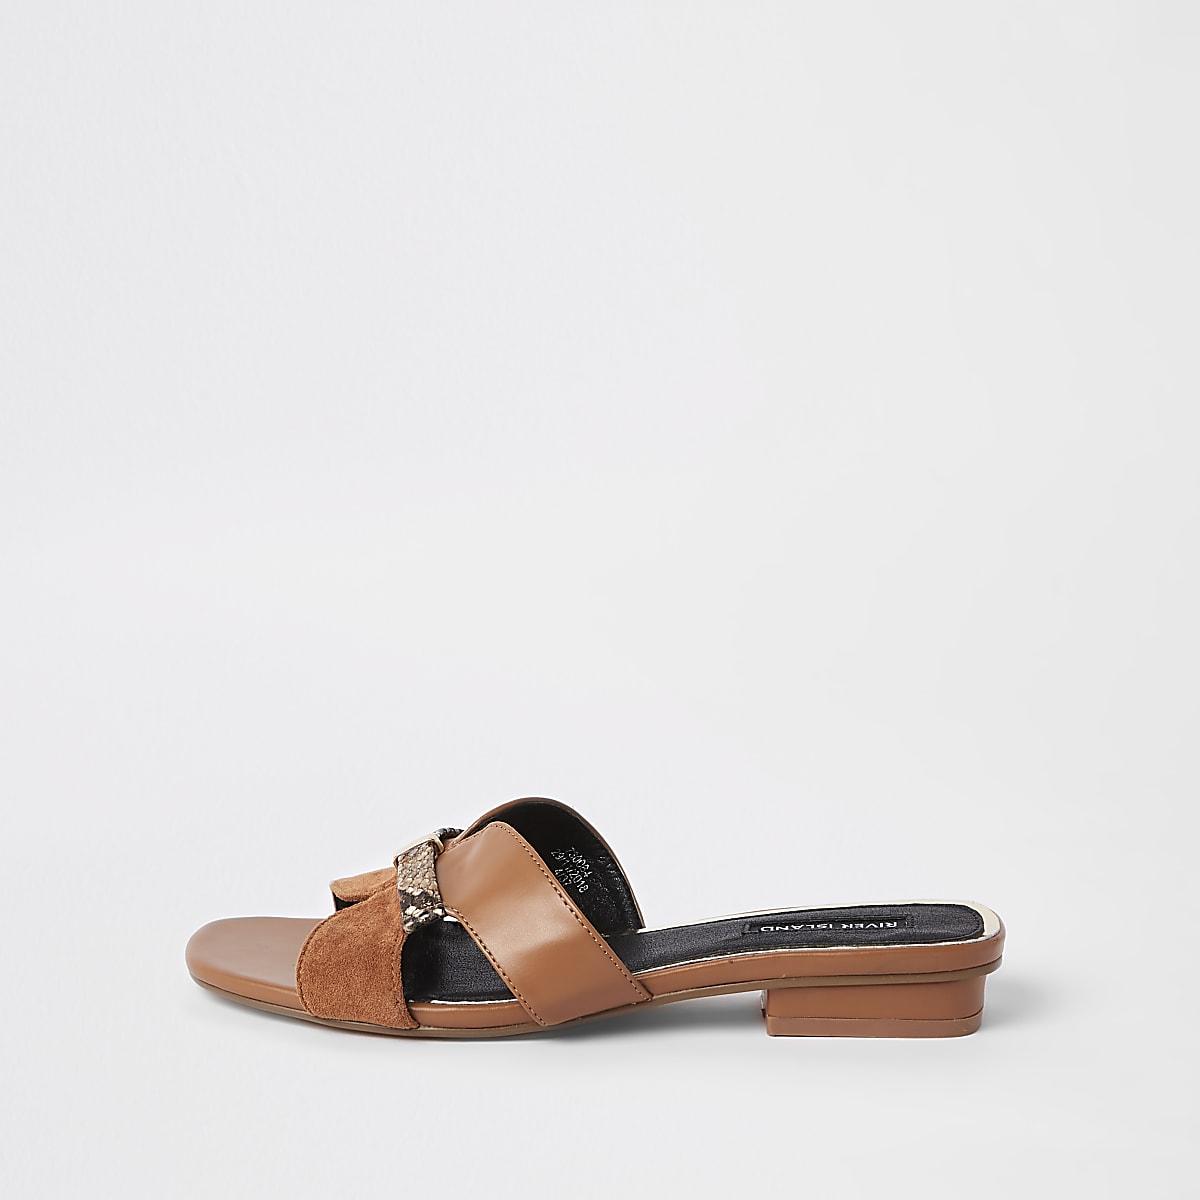 Brown faux leather flat mule sandal